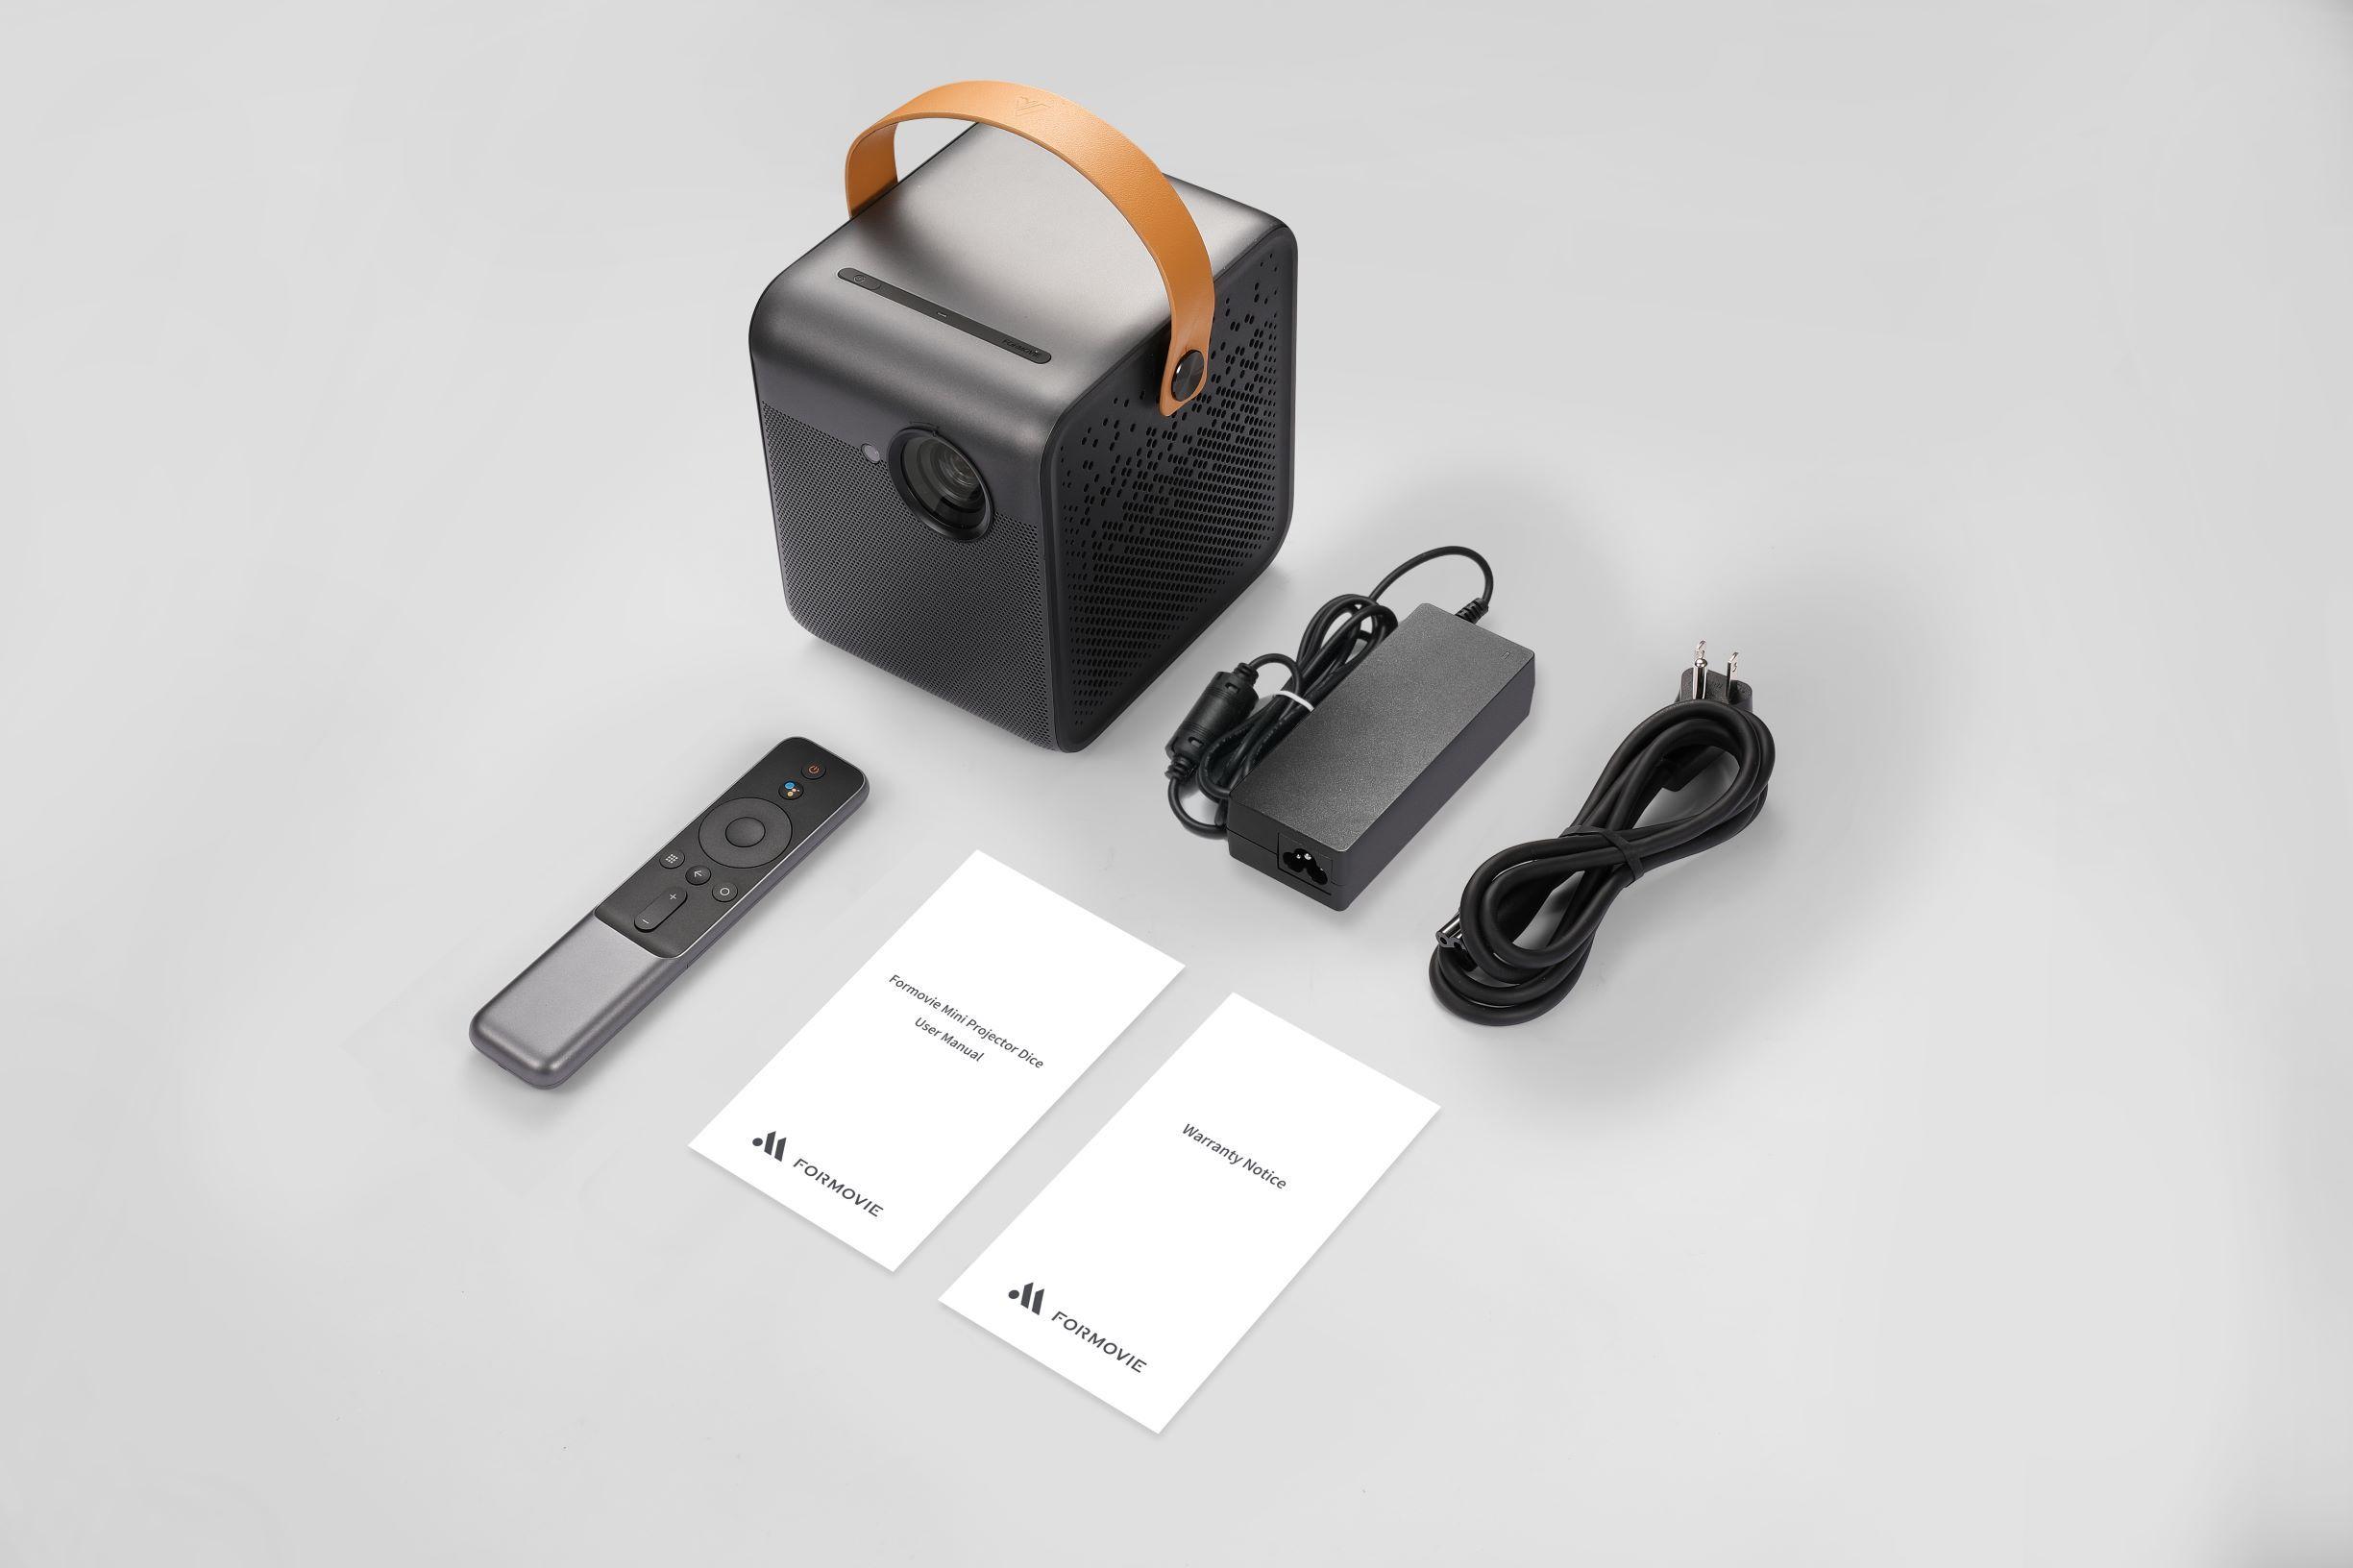 WeMax Dice portable Projector